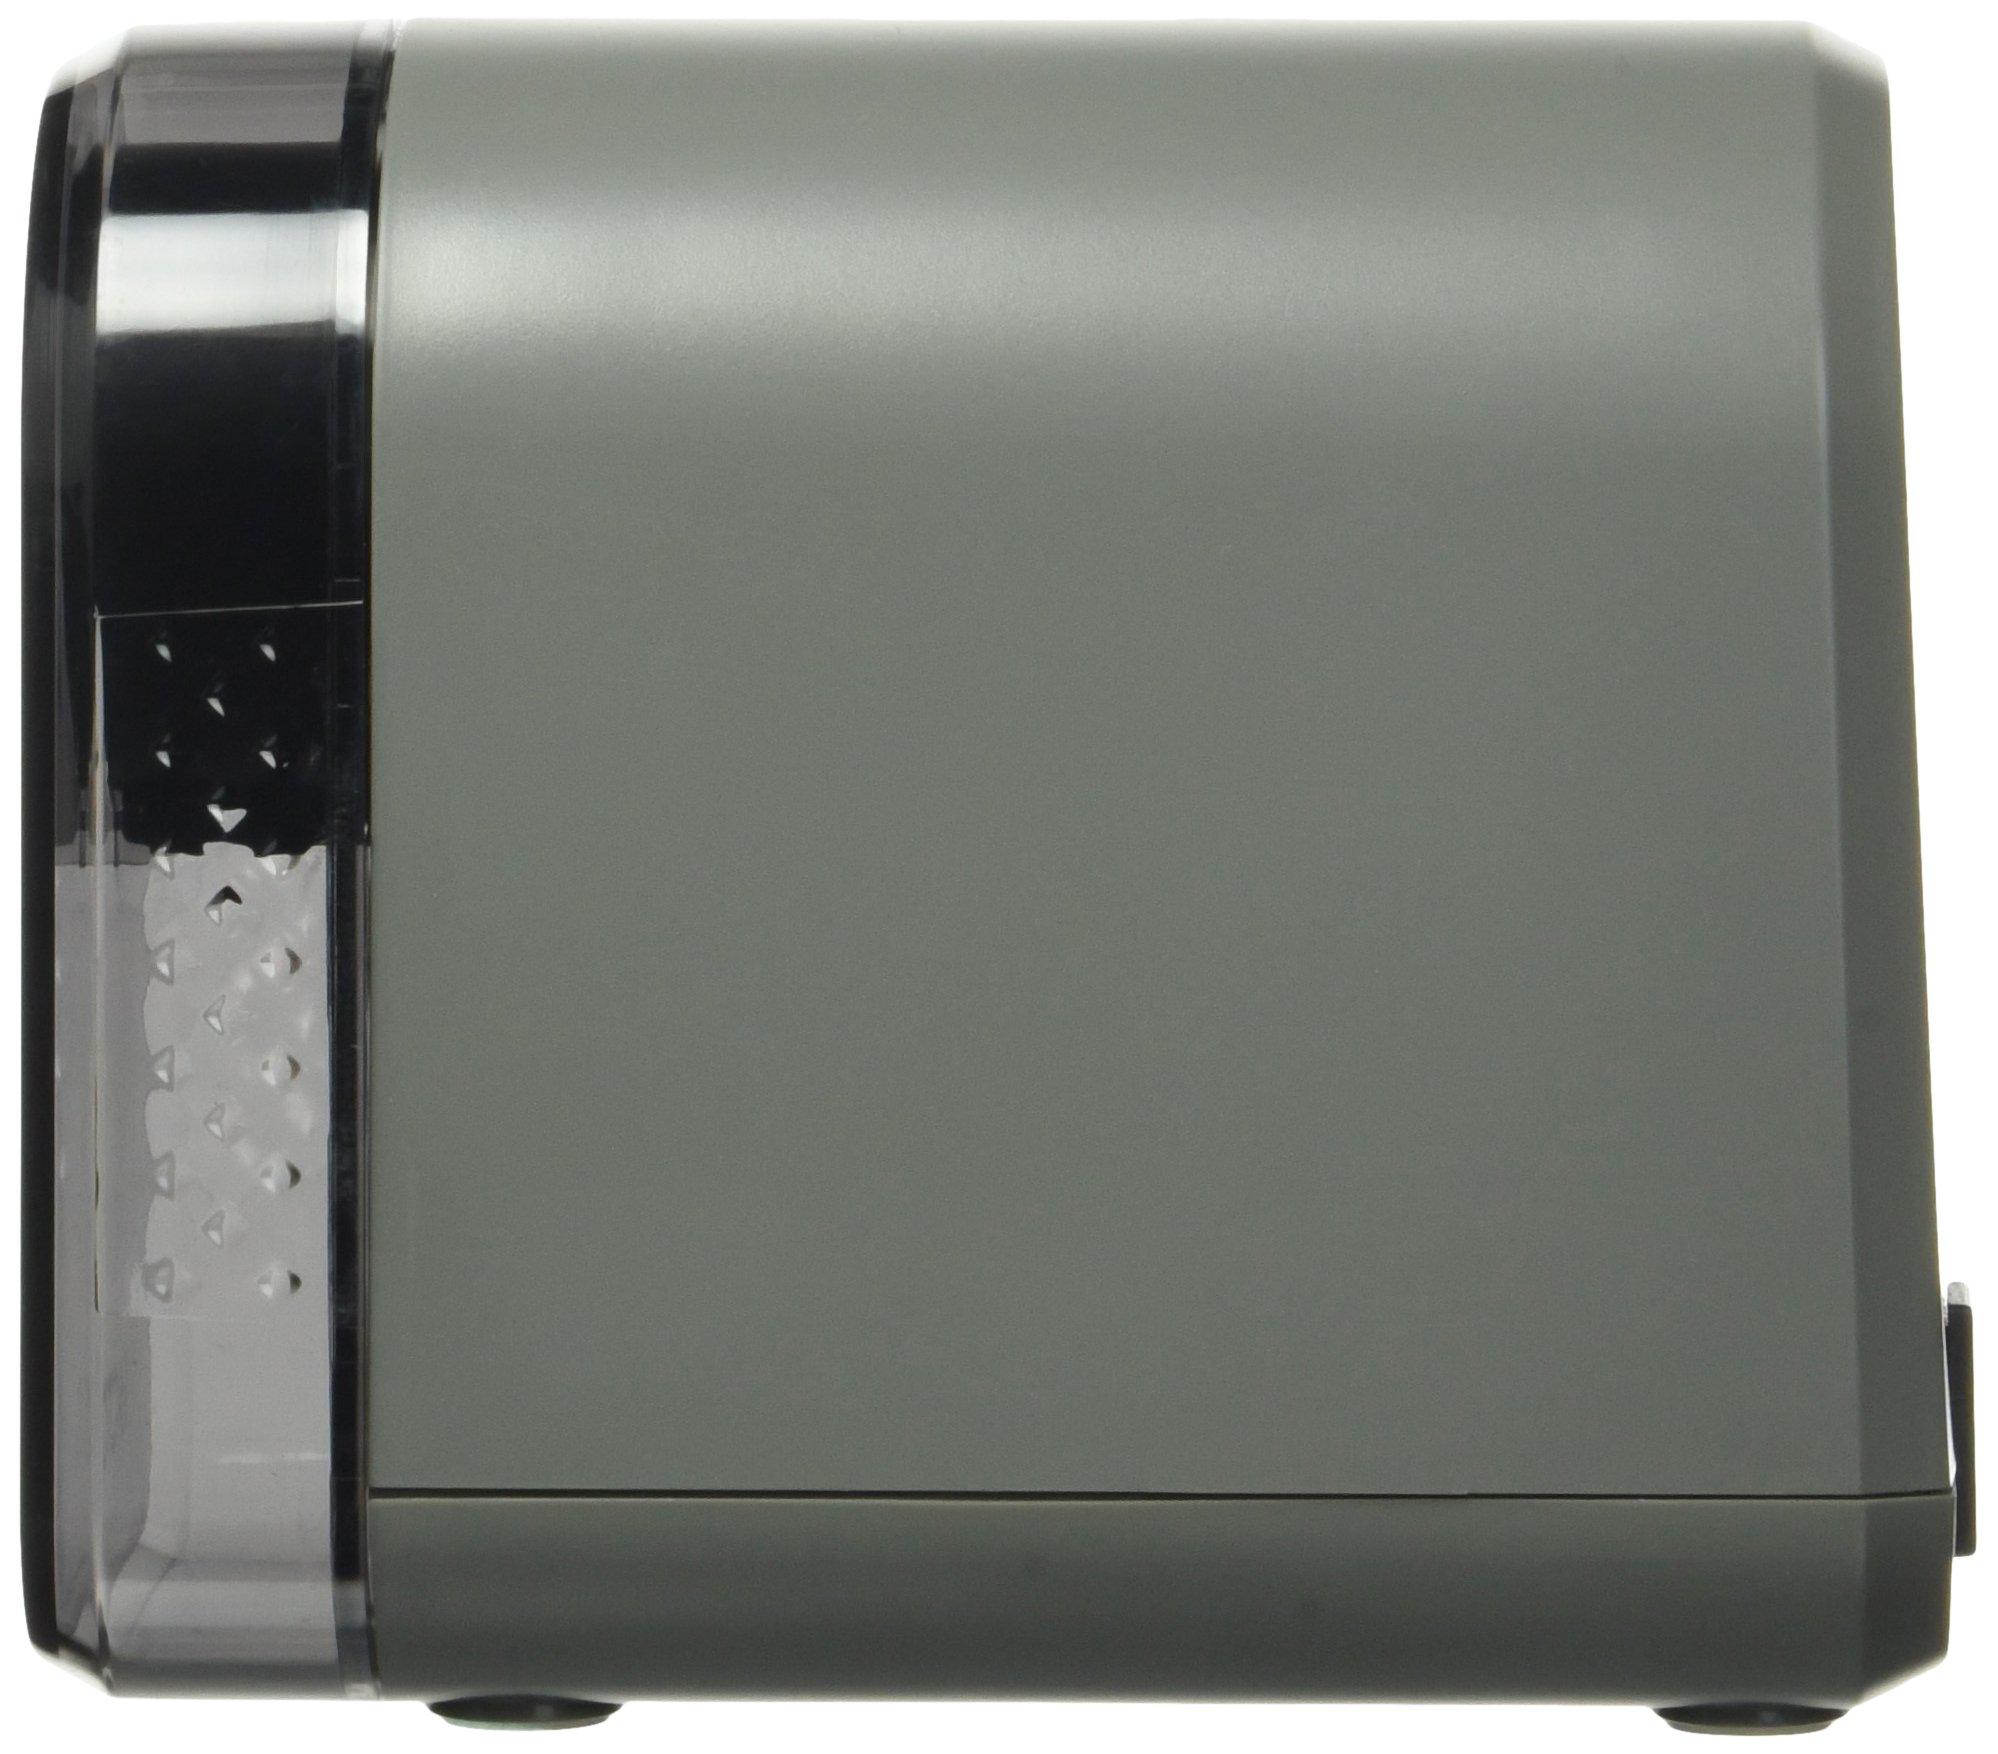 X-ACTO Mighty Mite Electric Pencil Sharpener, Black (W19505Q)